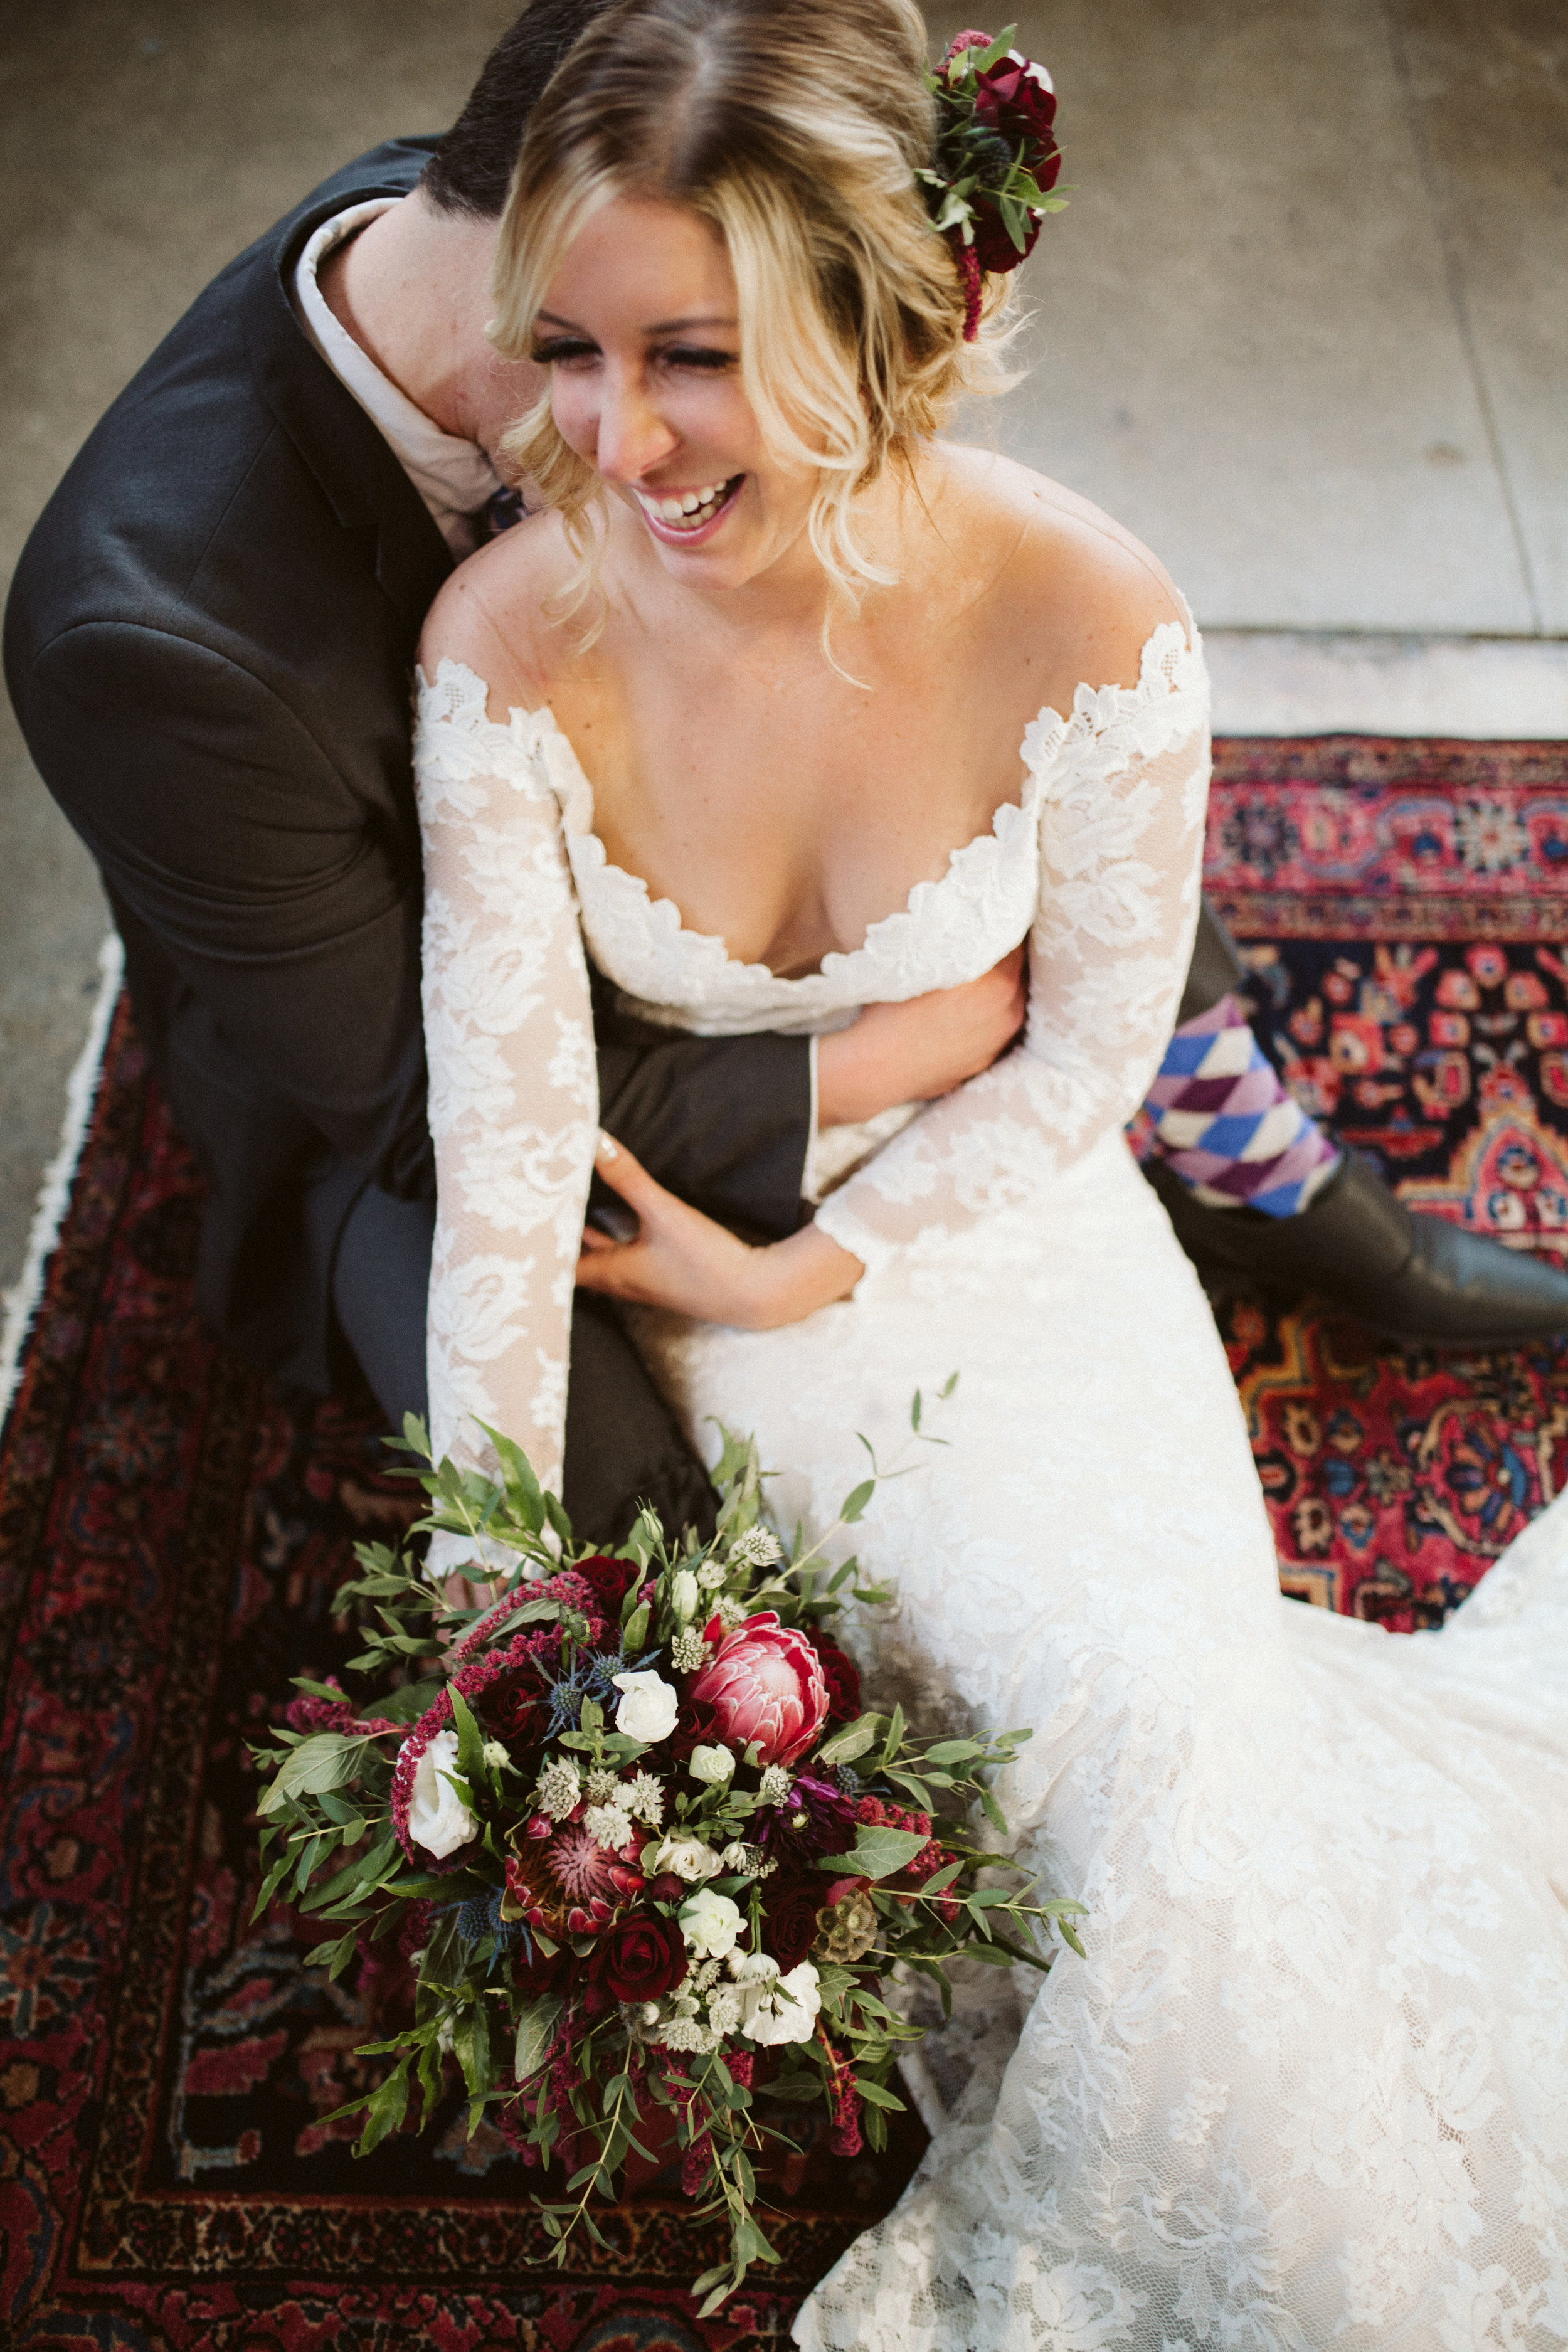 Offerings - Bridal & Bridesmaids BouquetsBoutonnieresCorsages & CuffsFloral Jewelry & ClutchesHeadwreaths & HairpiecesCenterpiecesGarlandsArbor / Chuppah ArrangementsAisle Chair / Pew BouquetsMiscellaneous Ceremony & Reception Arrangements